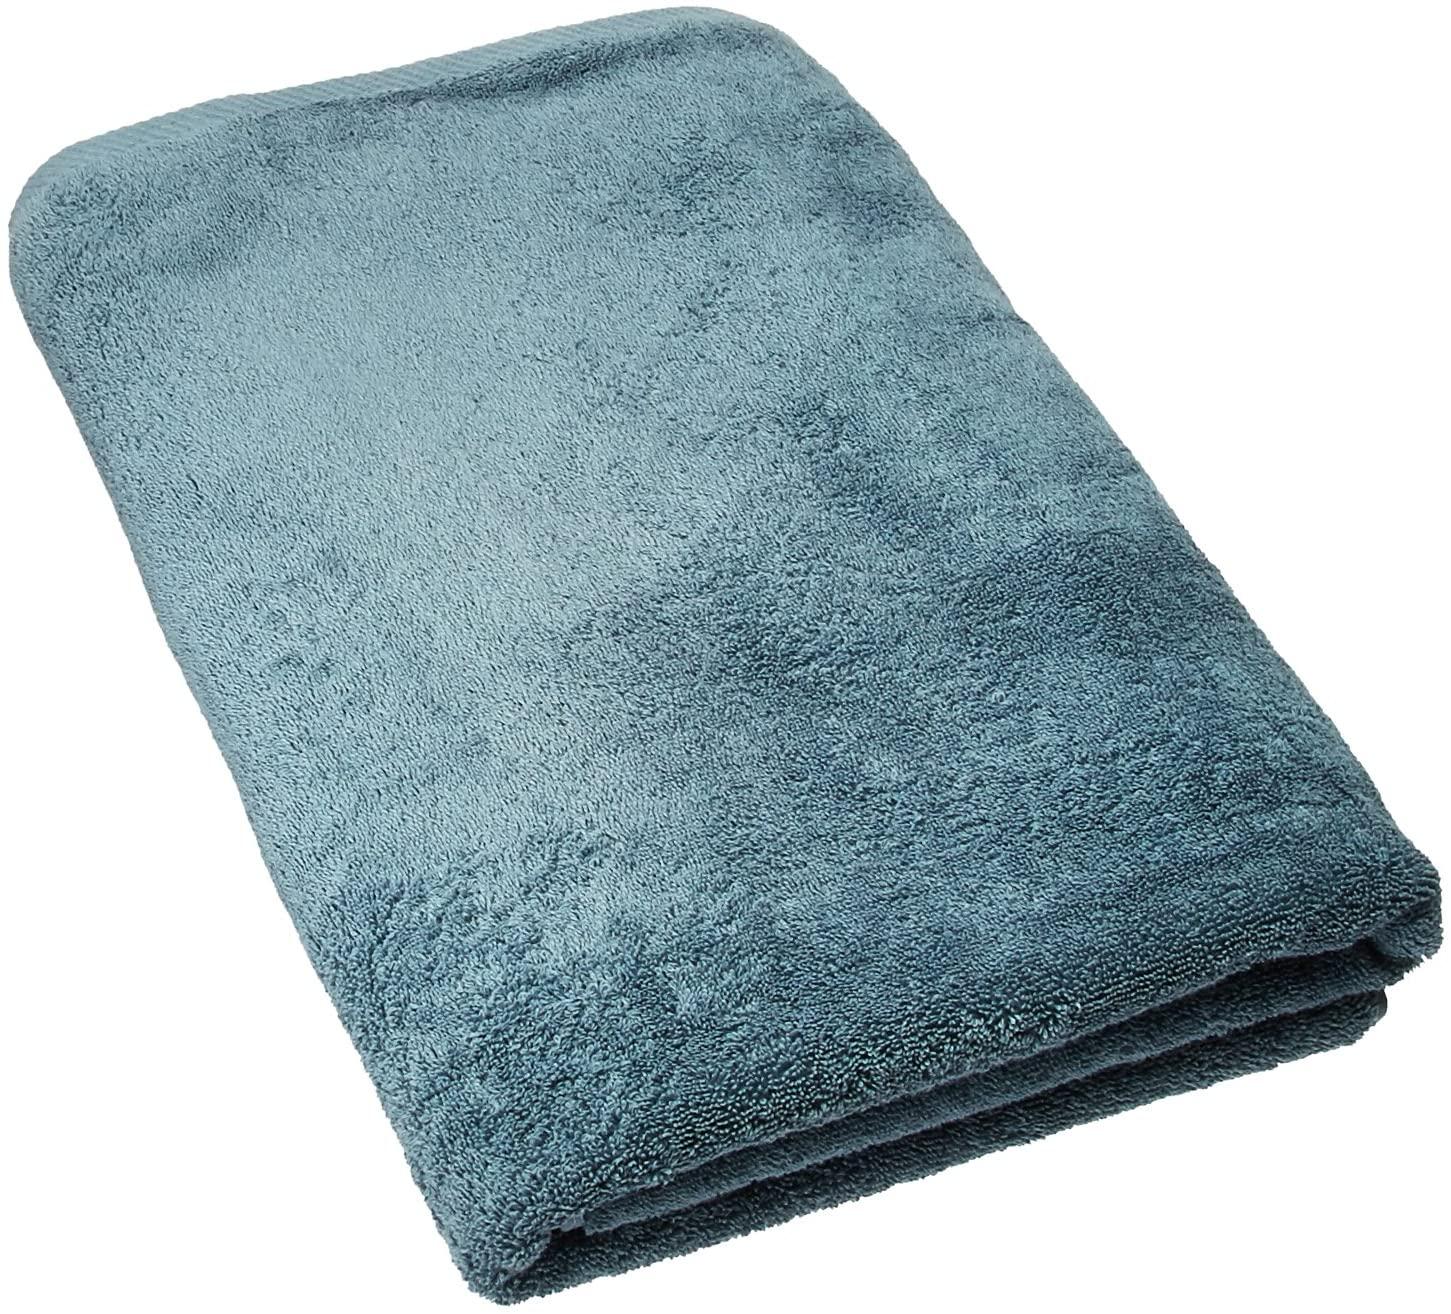 Turkuoise Premium Quality Bath Sheet, Extra Large, 100% Turkish Cotton